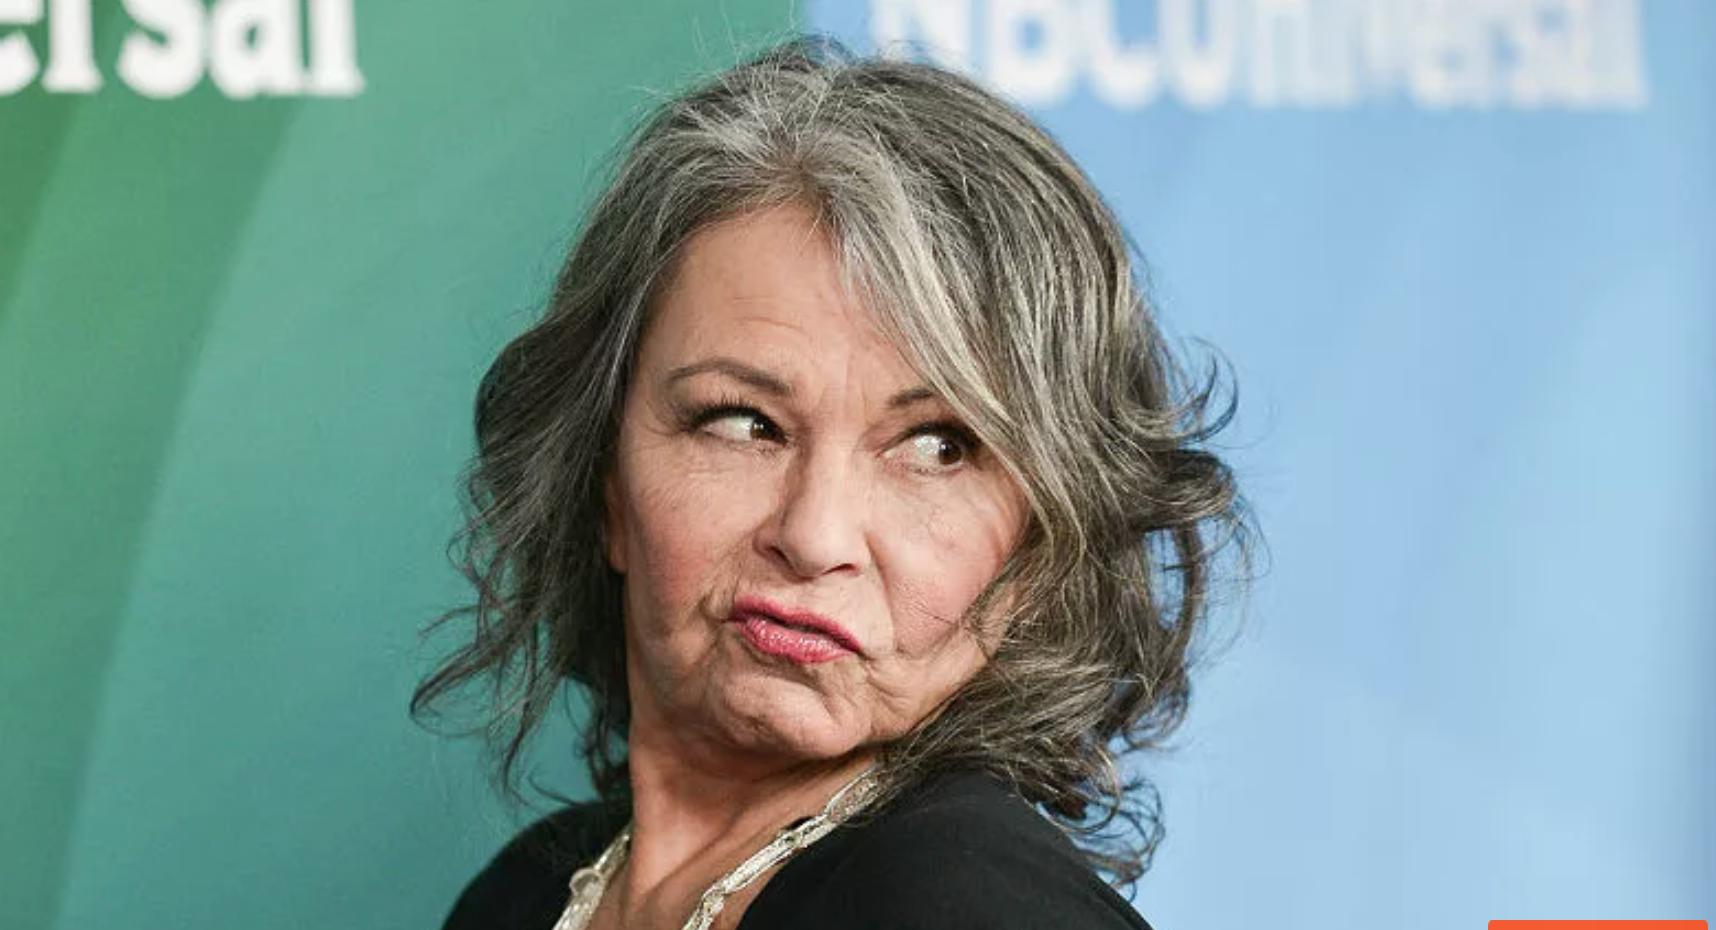 Roseanne Barr fox news